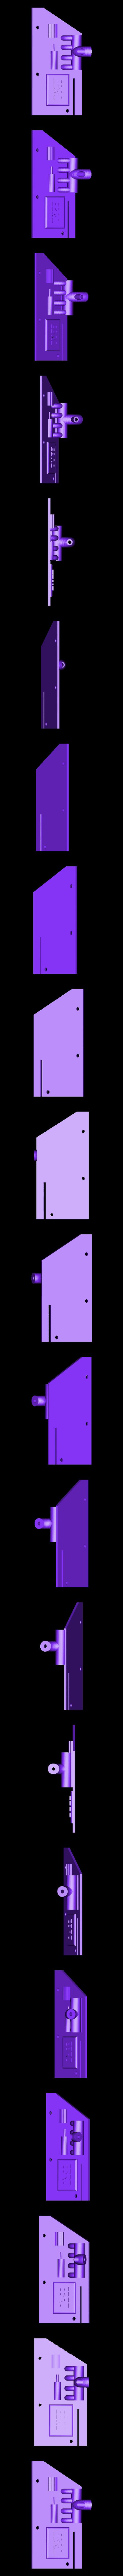 12b-motor_left.stl Download free STL file OpenRC Tractor • 3D printable object, makitpro